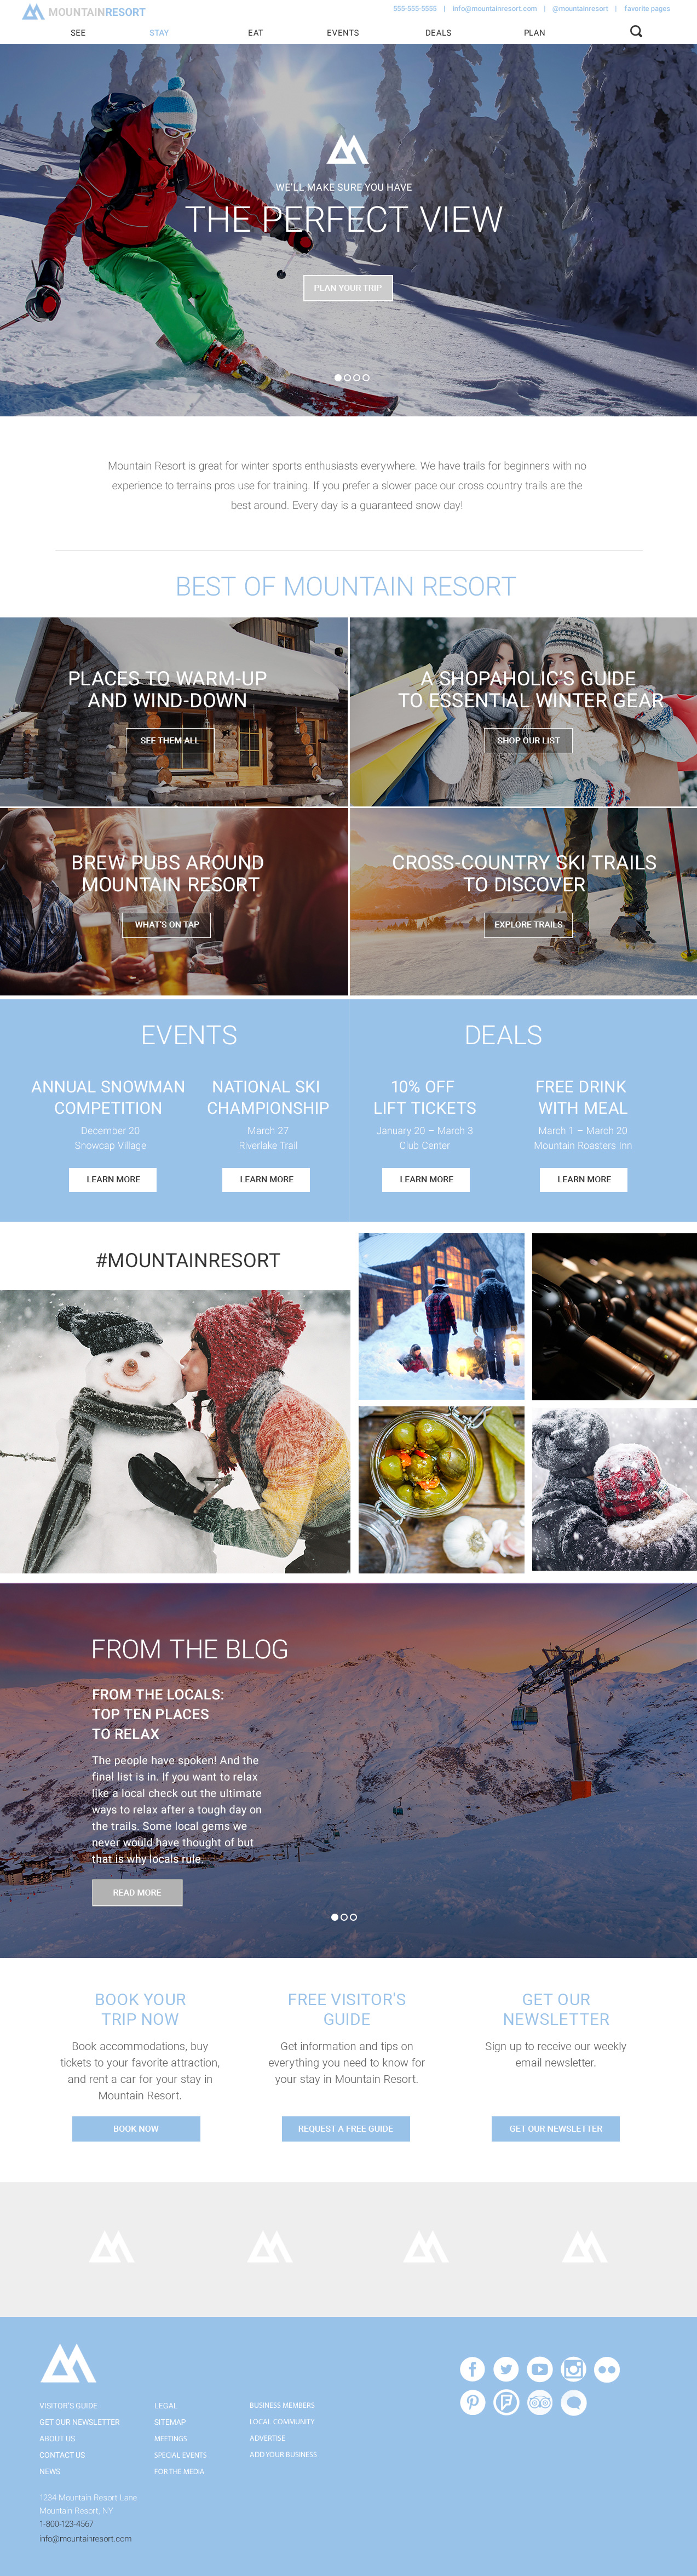 Mountain Resort Theme Homepage Desktop Preview